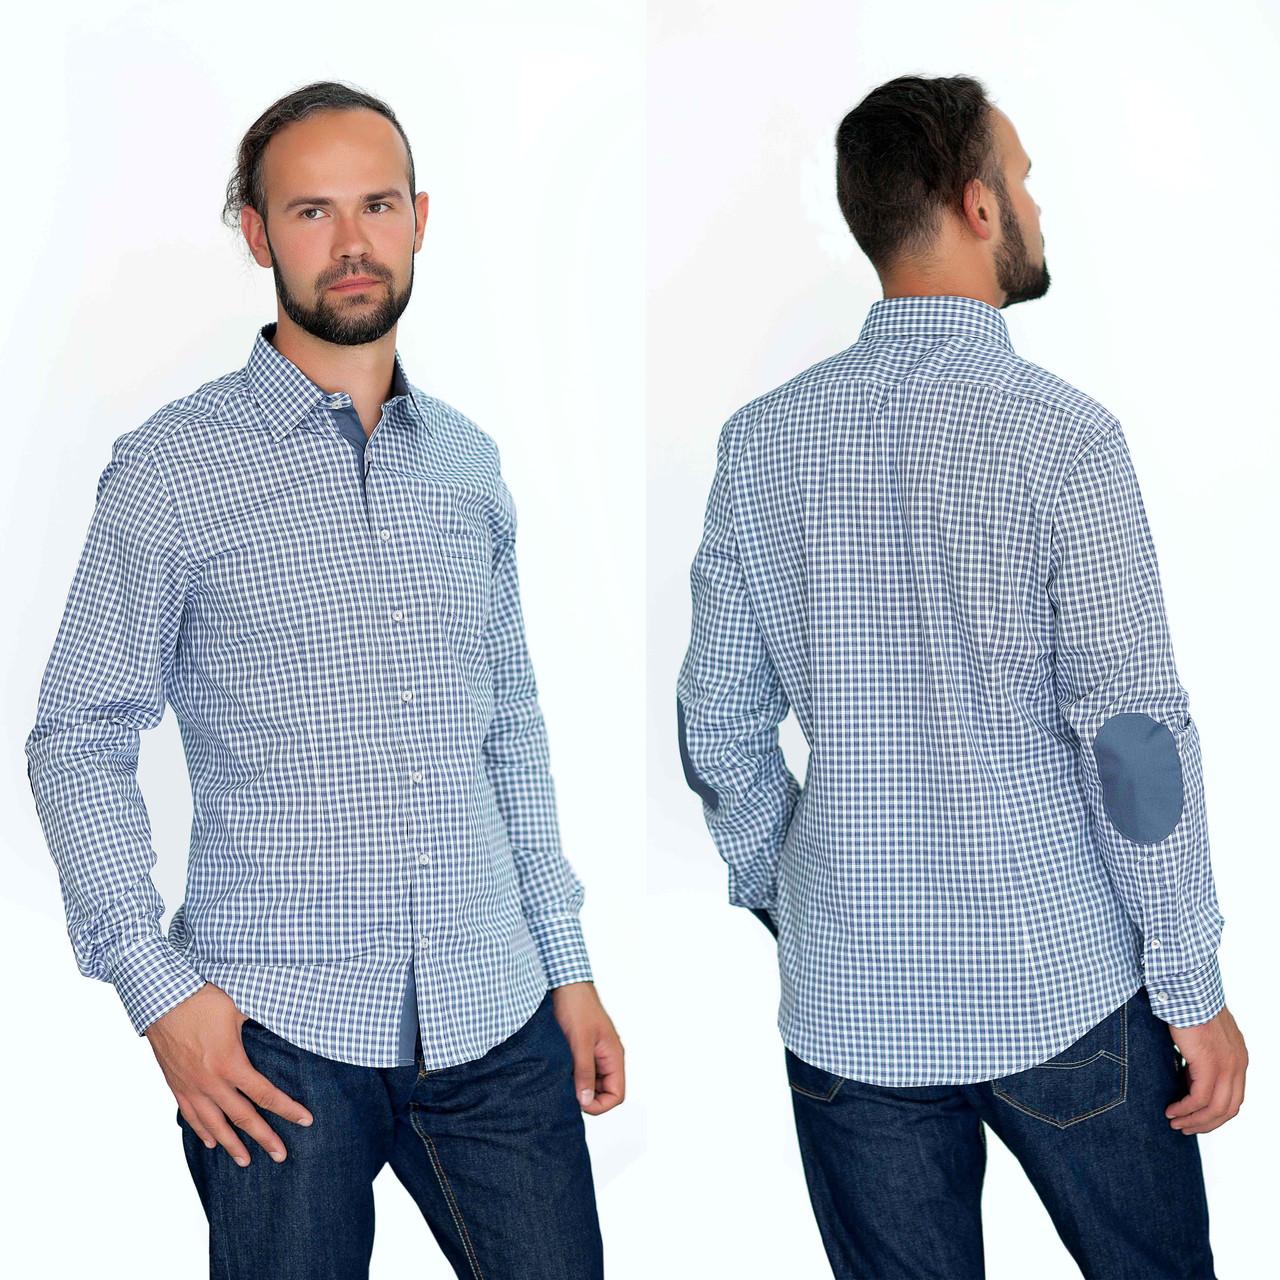 c97b09bf7b2 Рубашка мужская серая